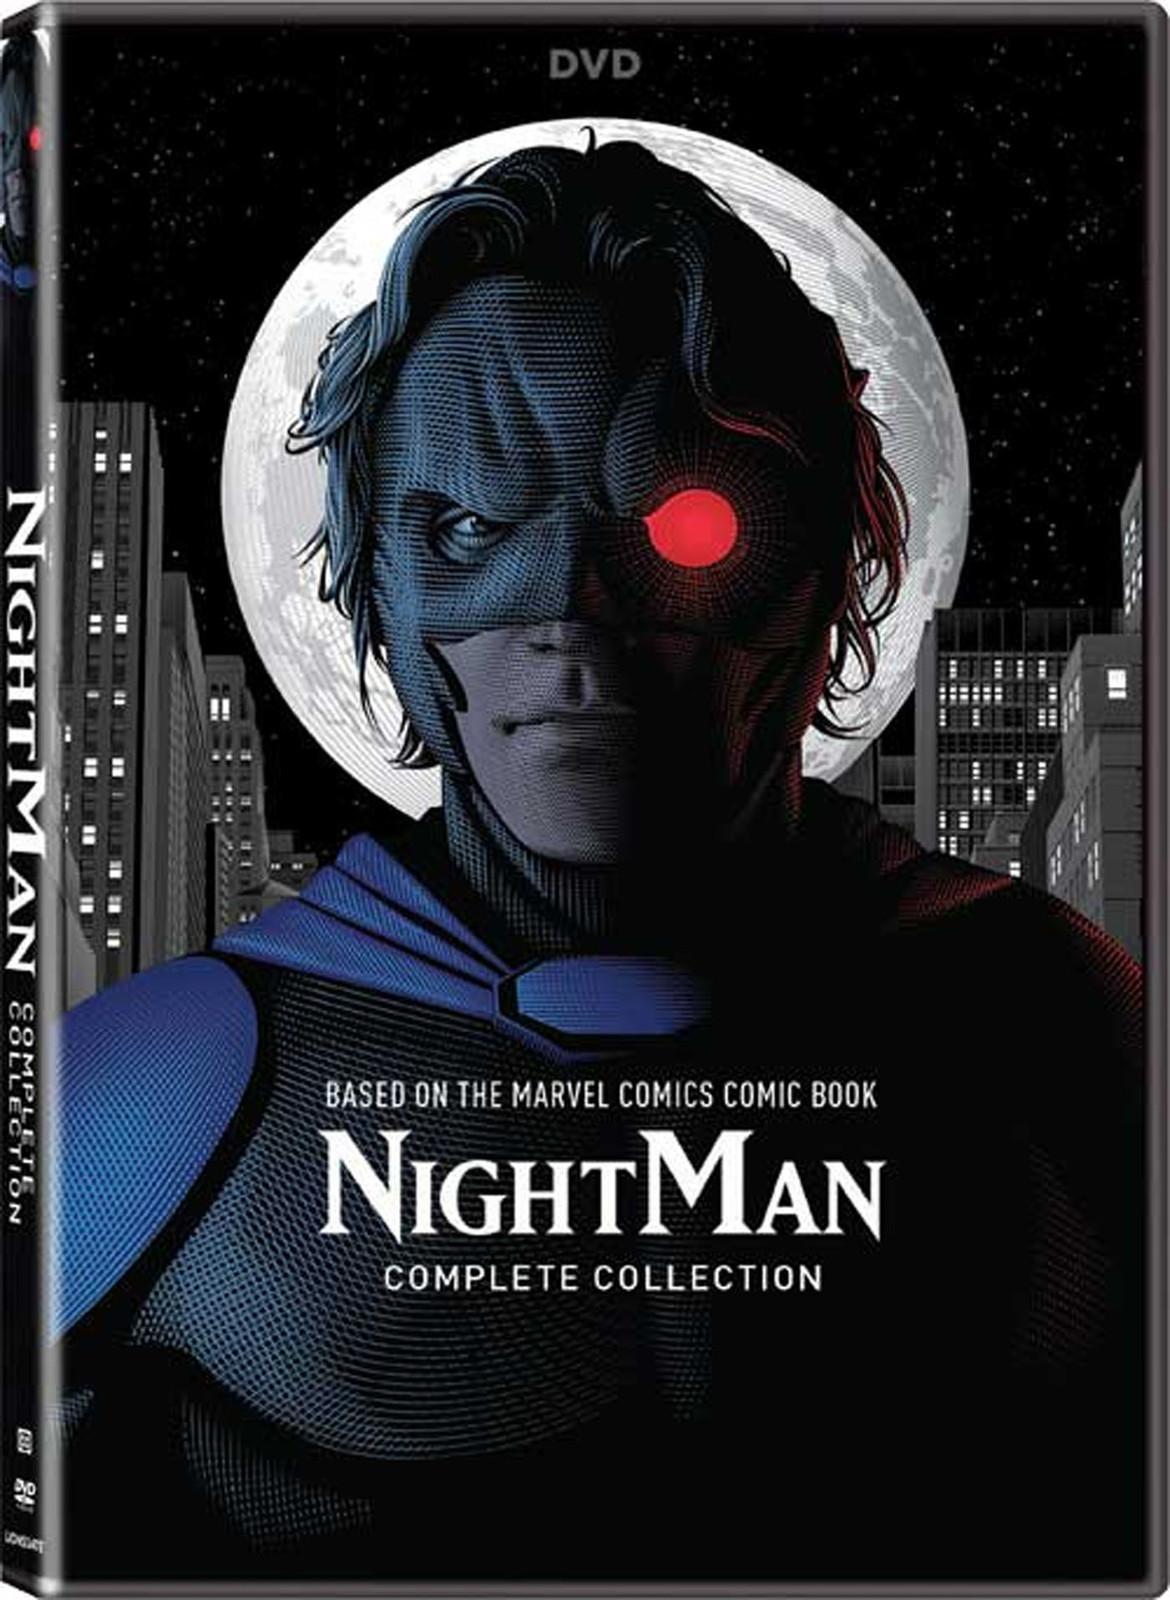 nightman_dvd_box.jpg